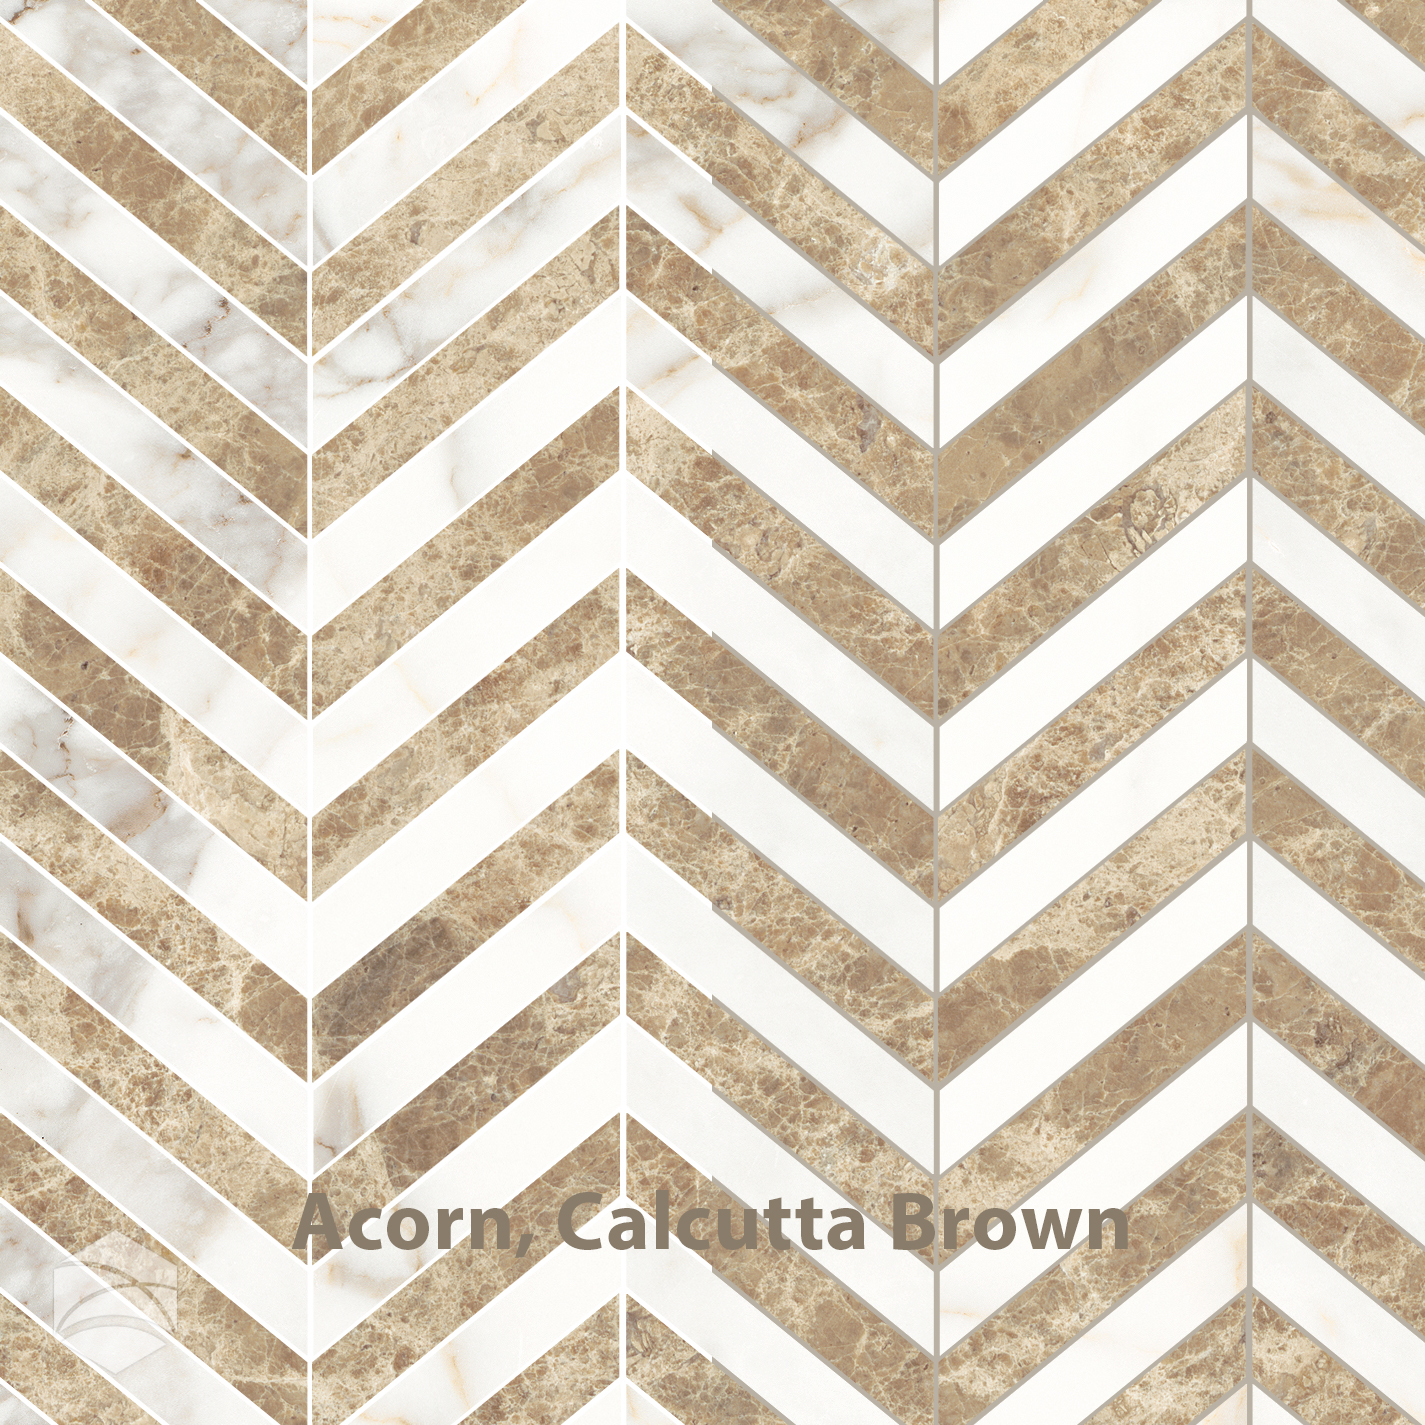 Acorn, Calcutta Brown_Chevron_V2_14x14.jpg